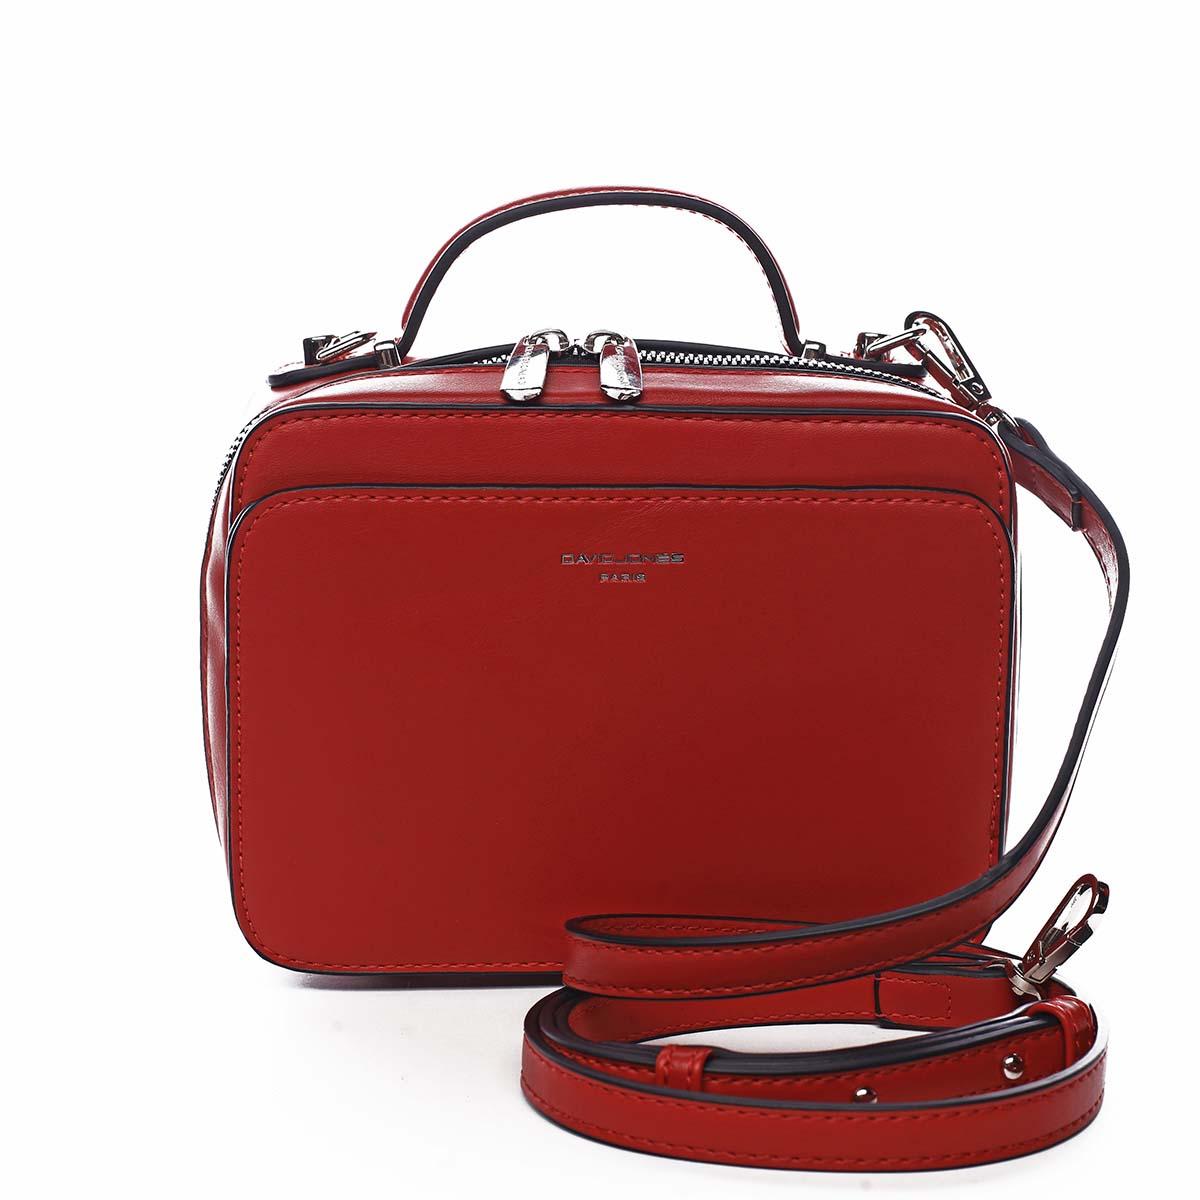 Dámská kabelka červená - David Jones Zara